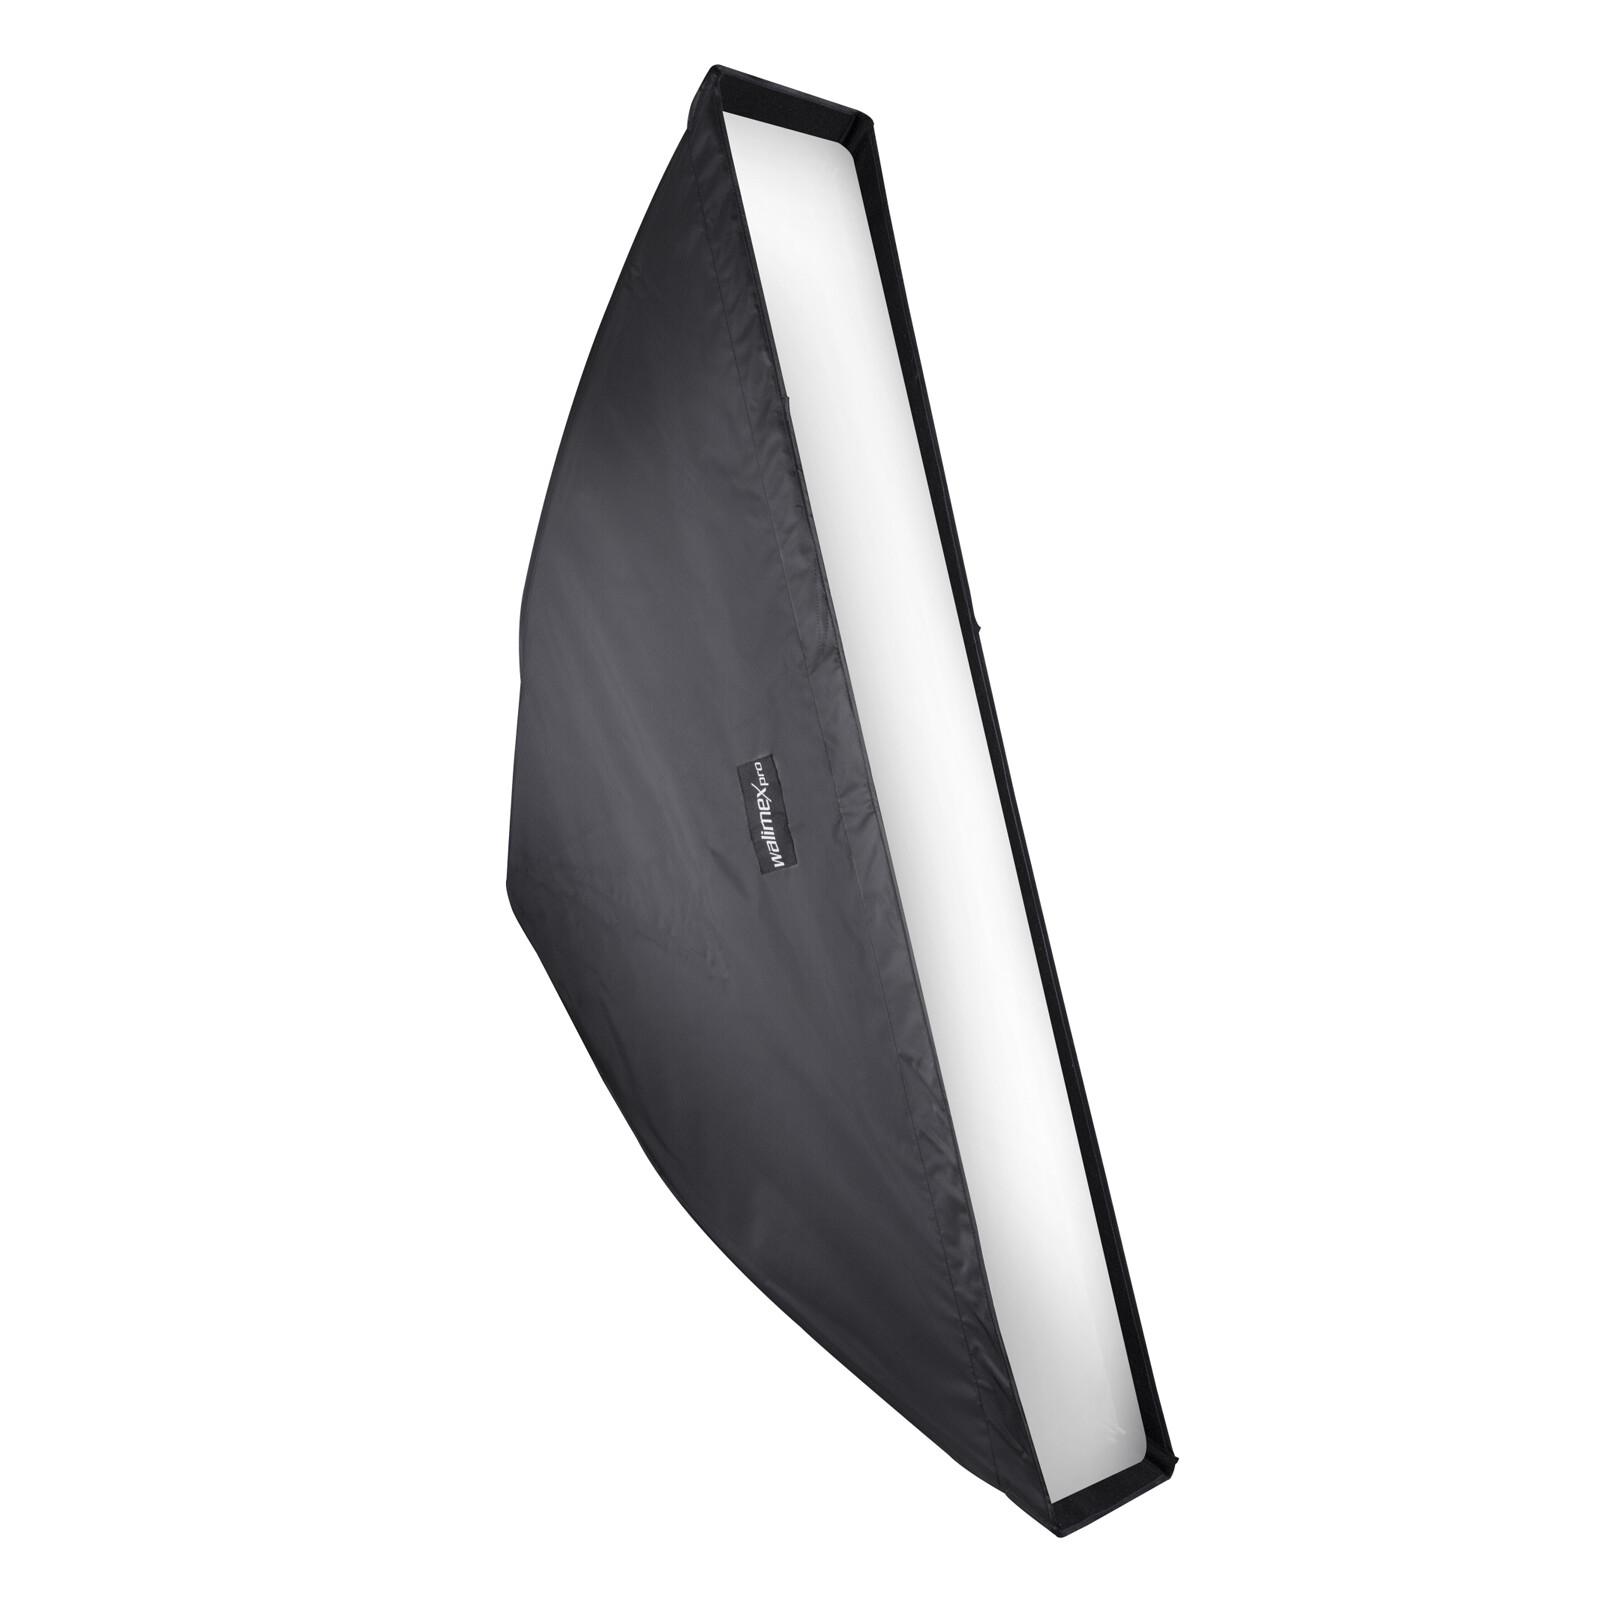 walimex pro easy Softbox 30x140cm Aurora/Bowens